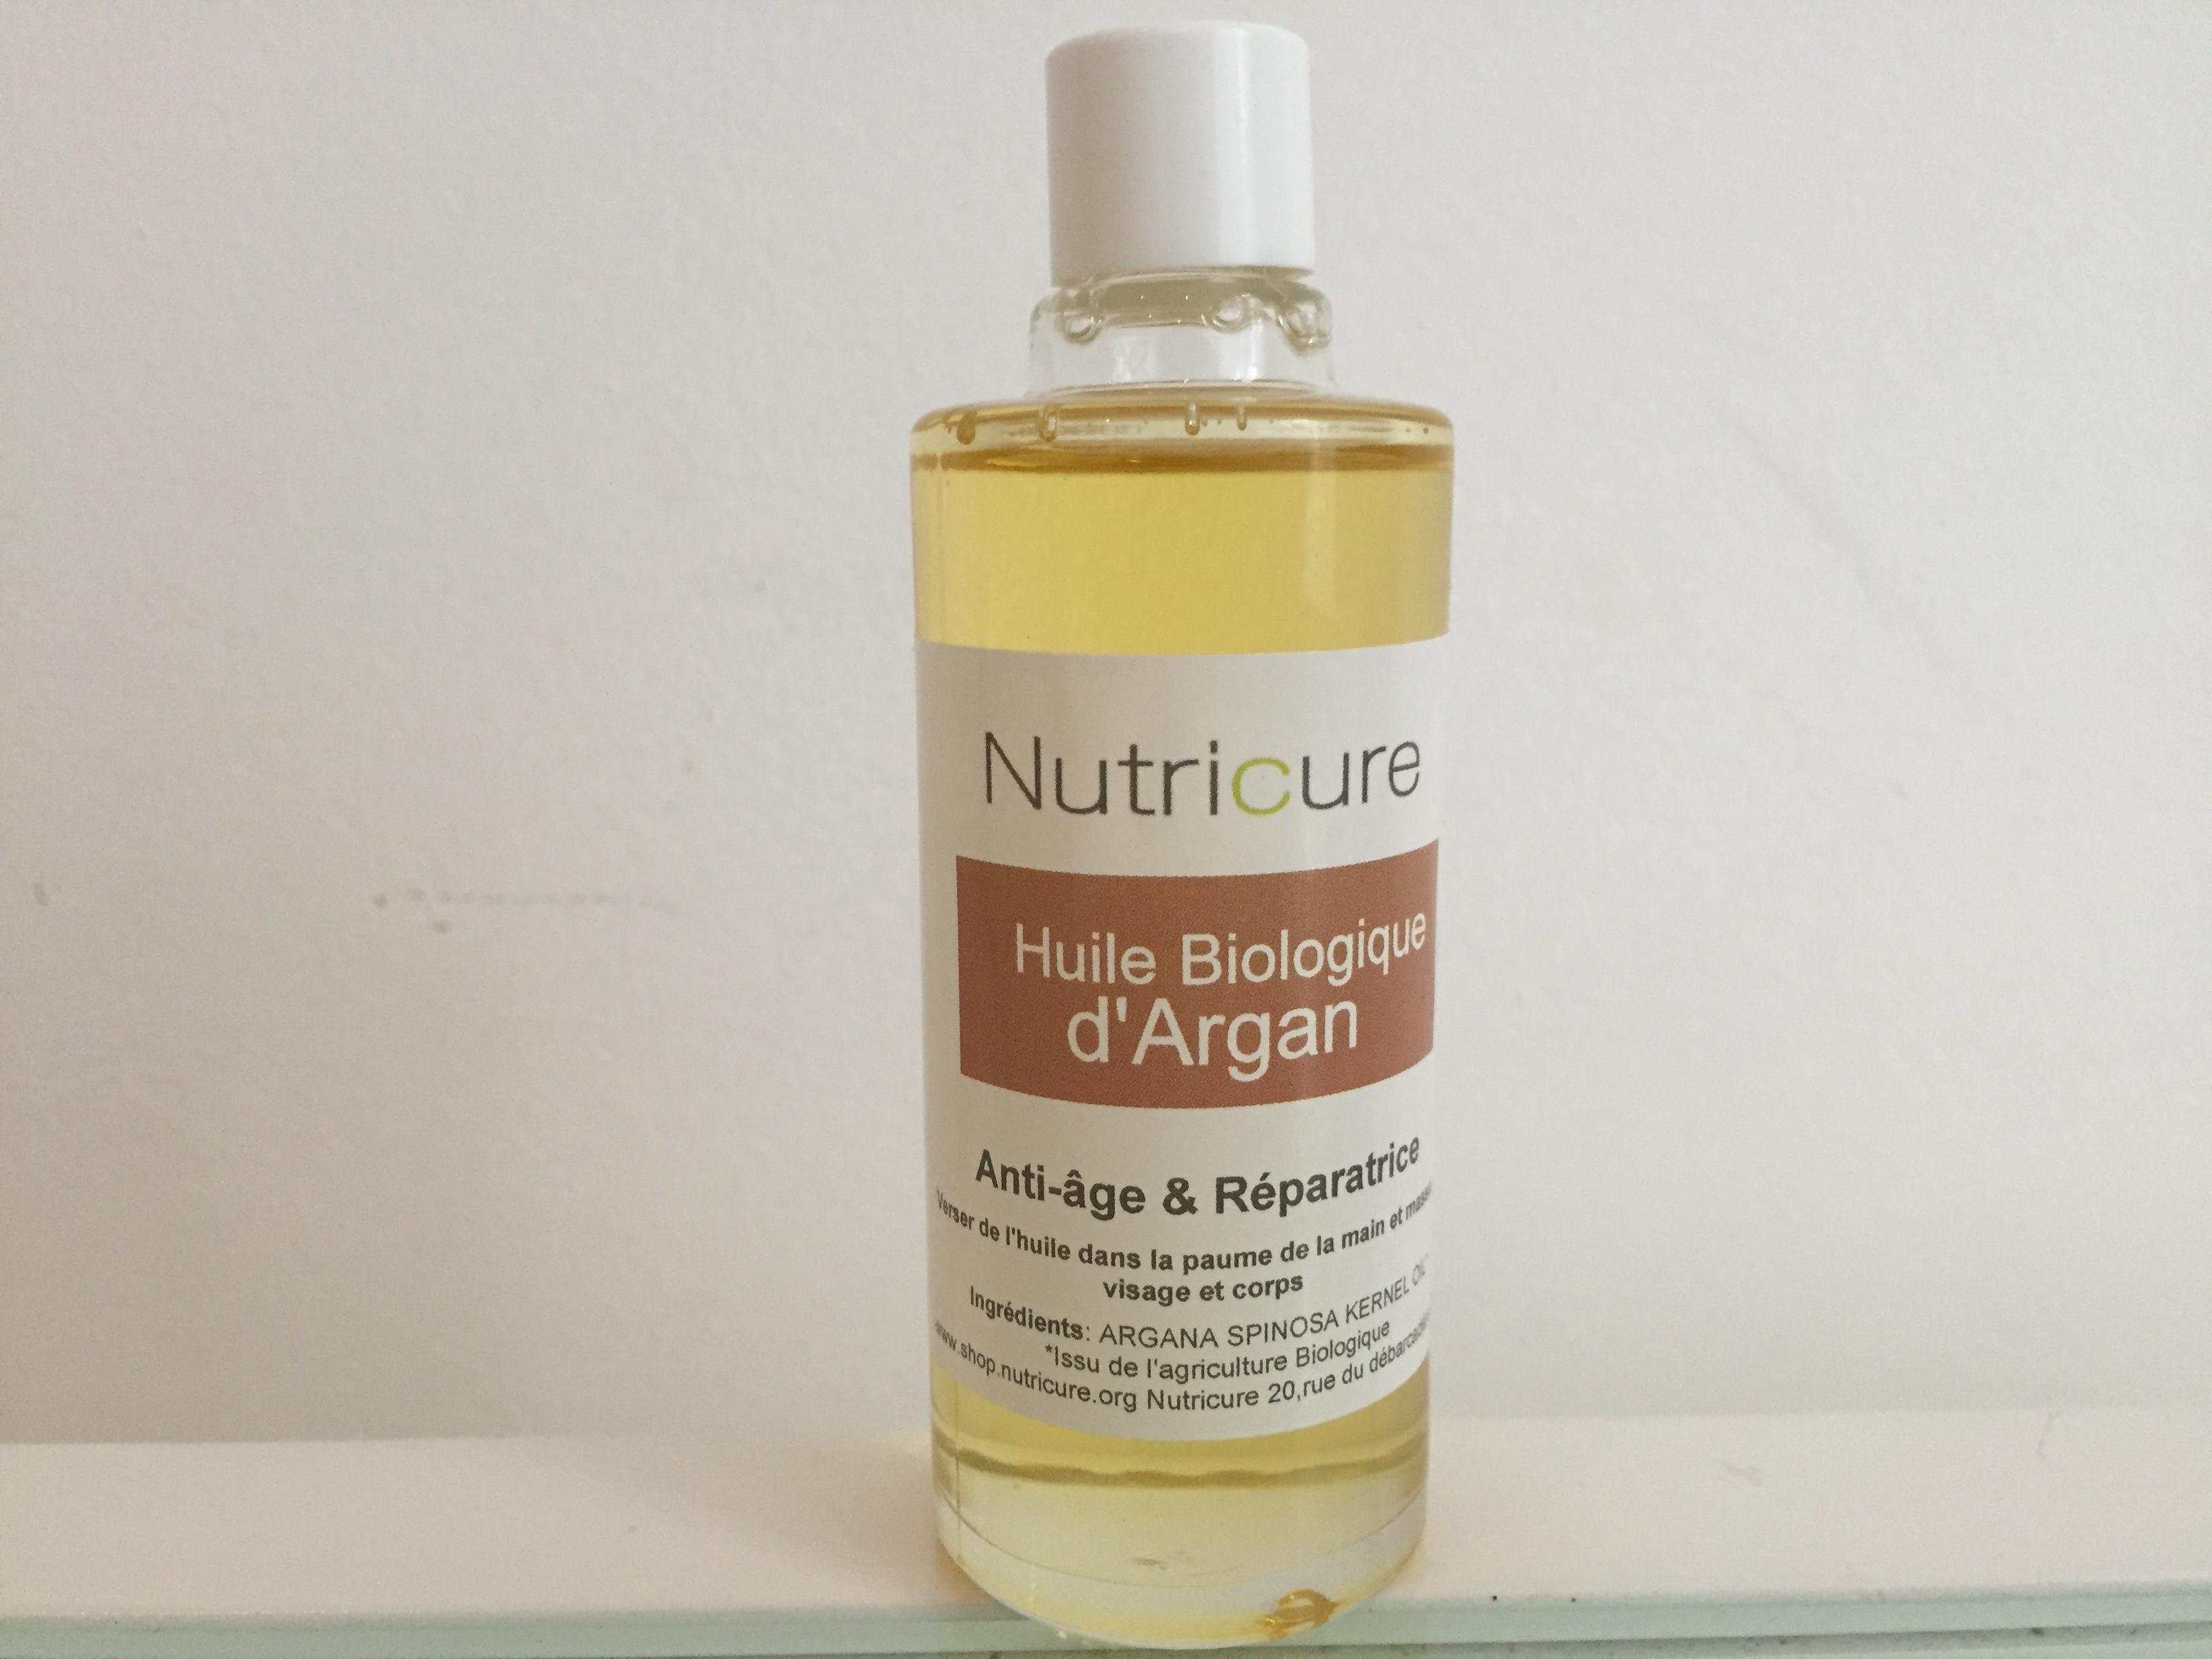 huile d argan biologique nutricure shop cure tisane d tox naturelle et bio. Black Bedroom Furniture Sets. Home Design Ideas